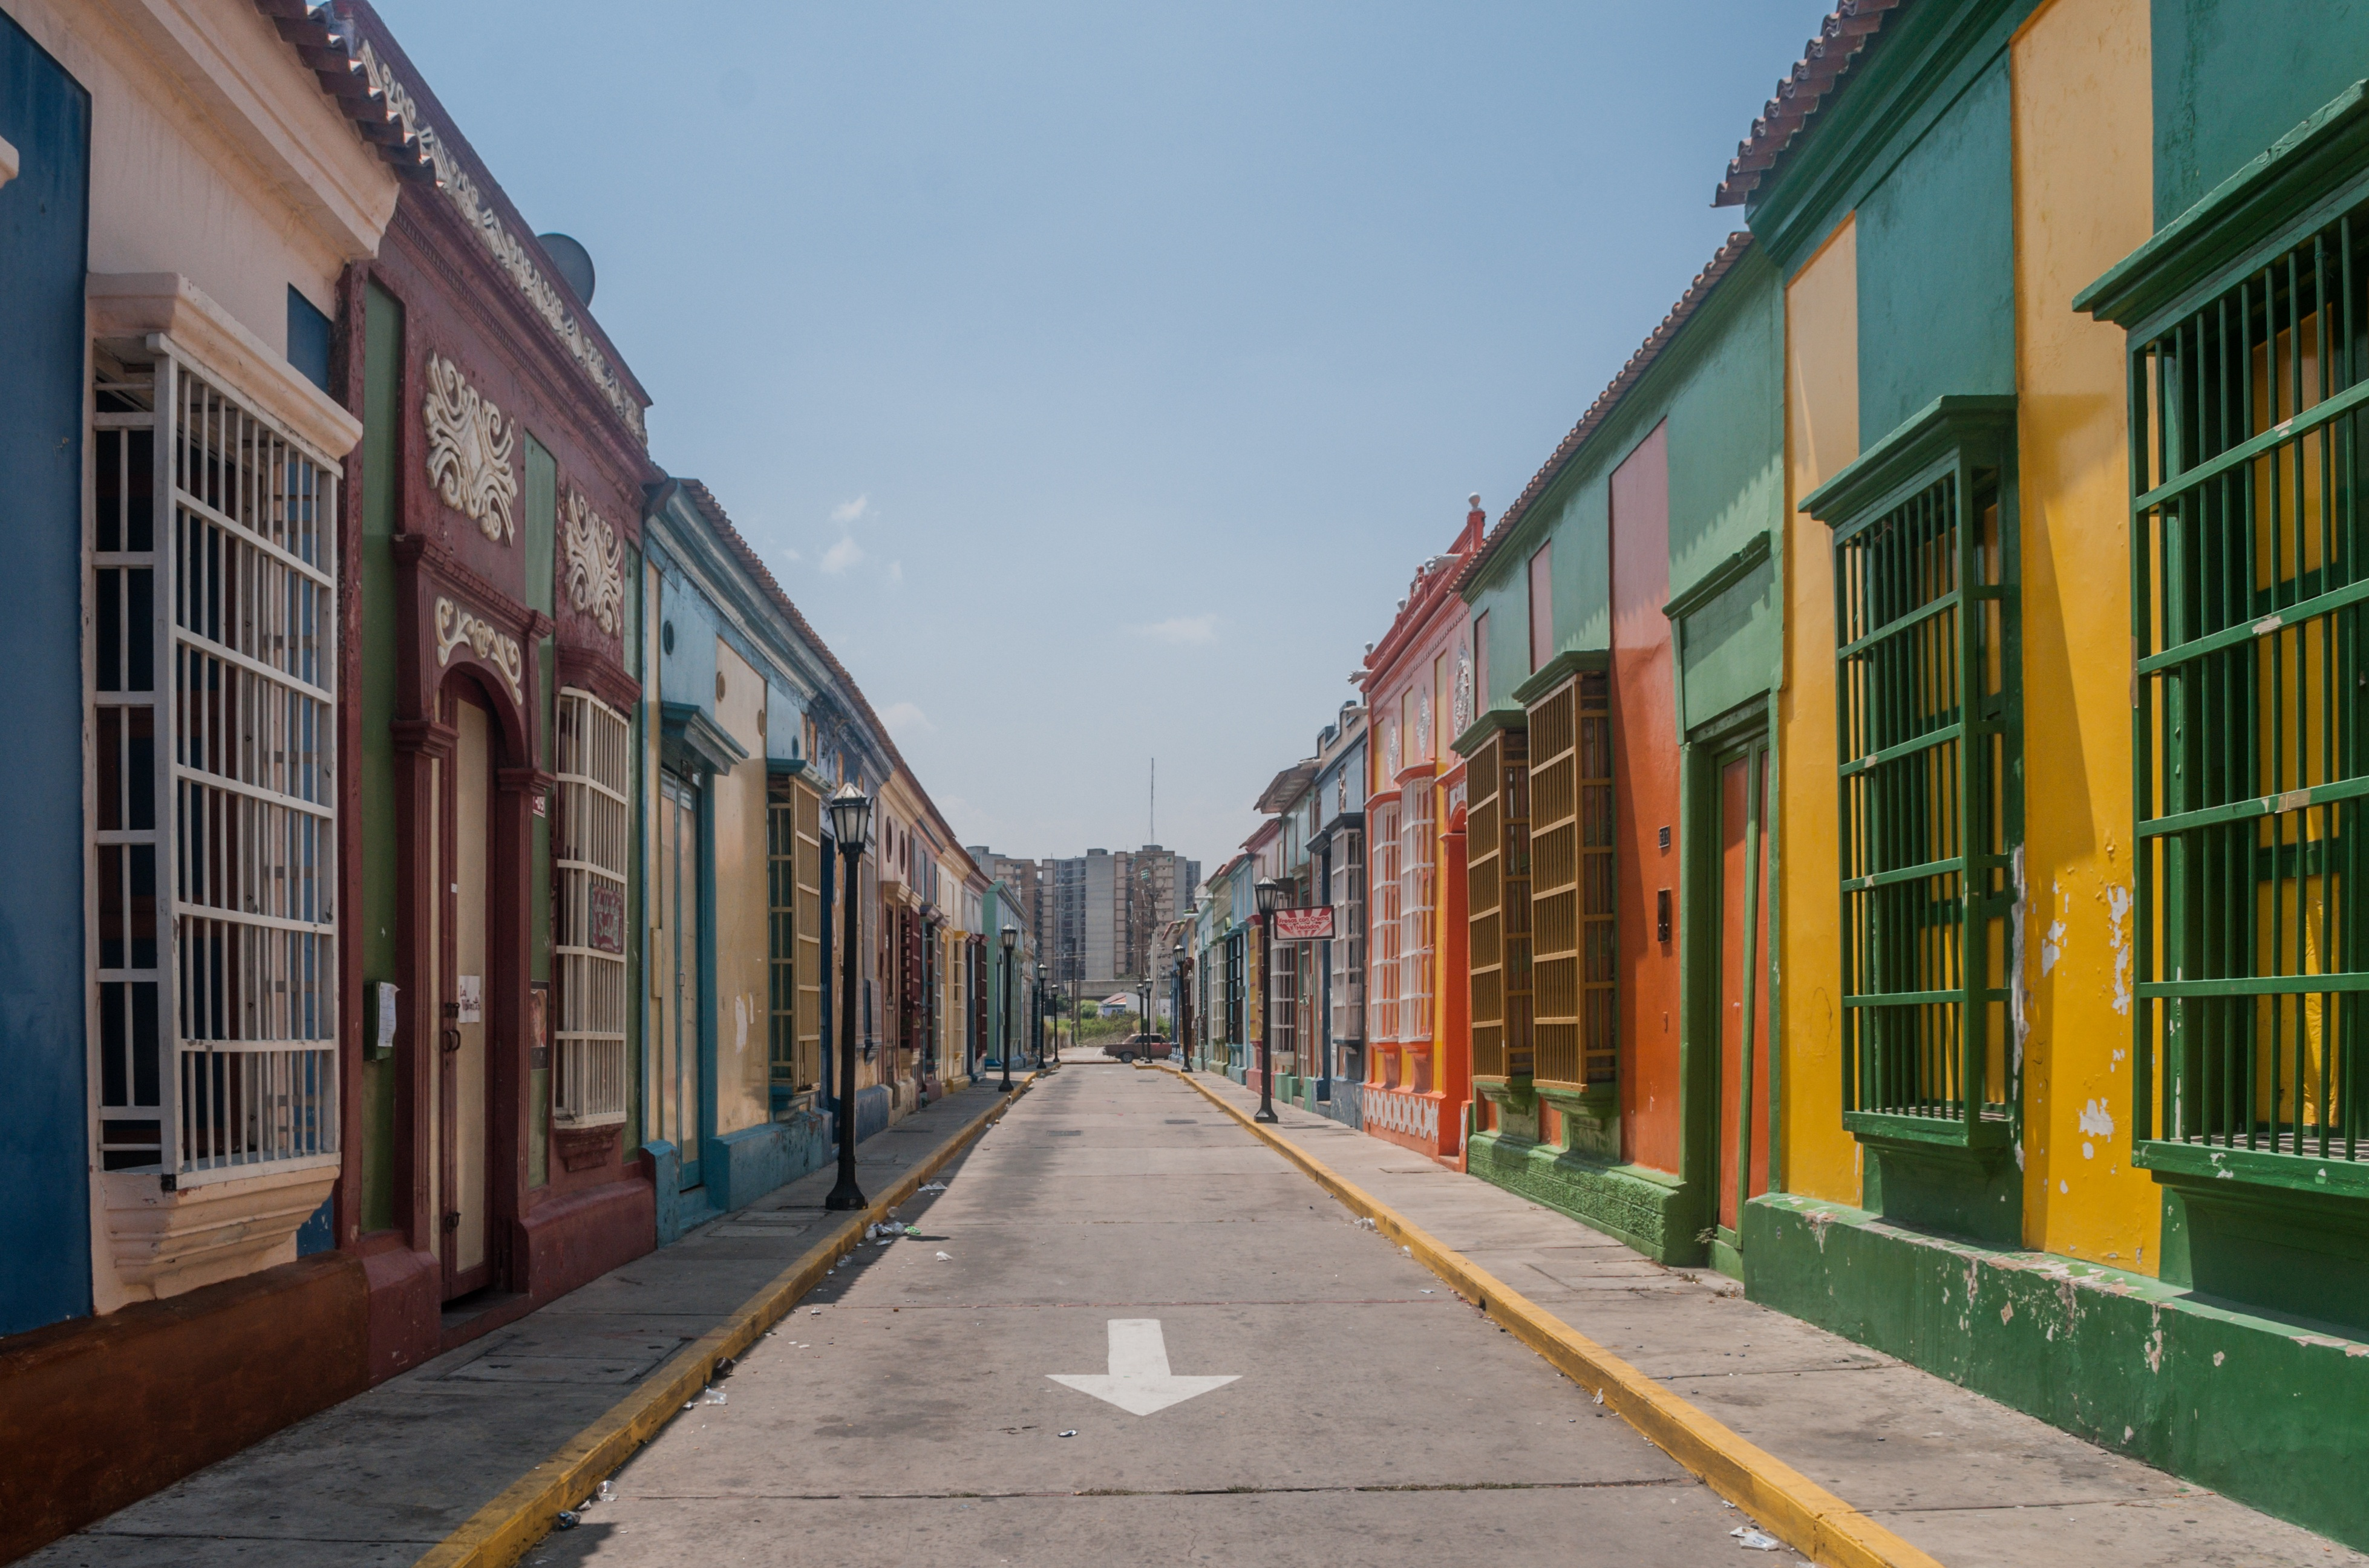 Empty Street, Architecture, Block, City, Construction, HQ Photo